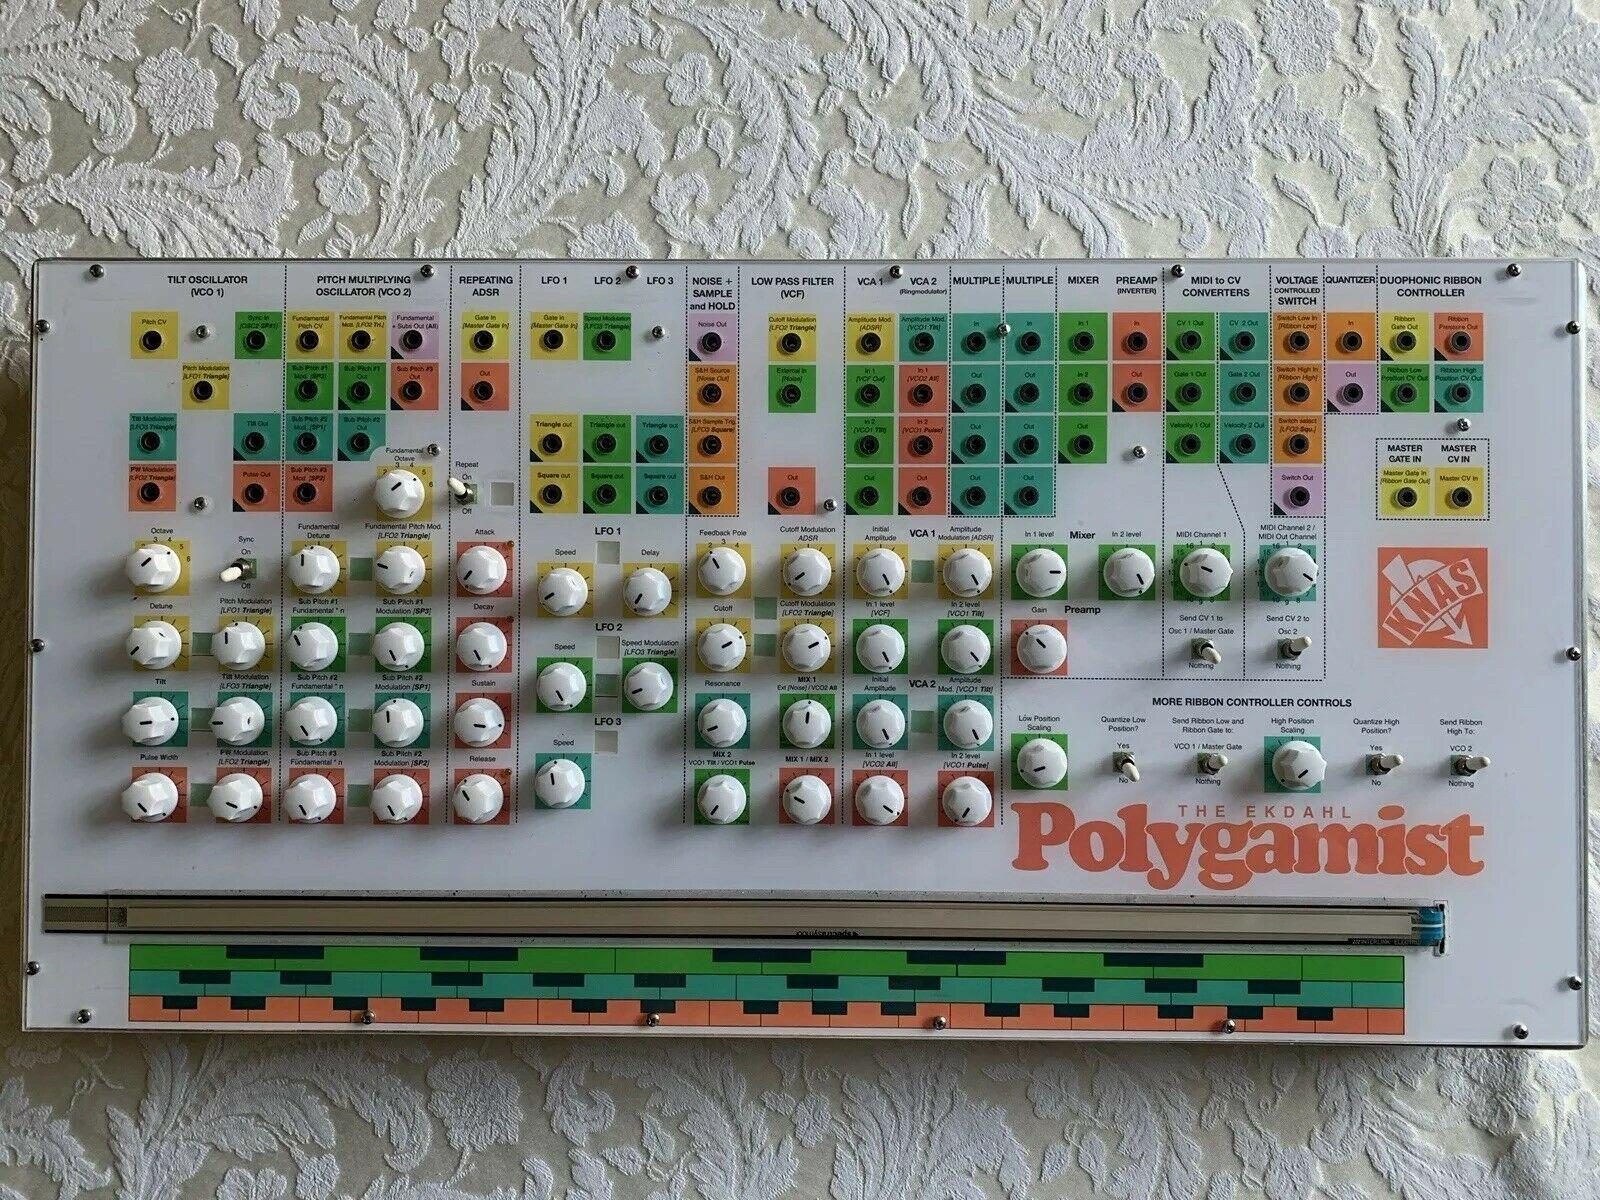 matrixsynth ekdahl polygamist modular synthesizer. Black Bedroom Furniture Sets. Home Design Ideas